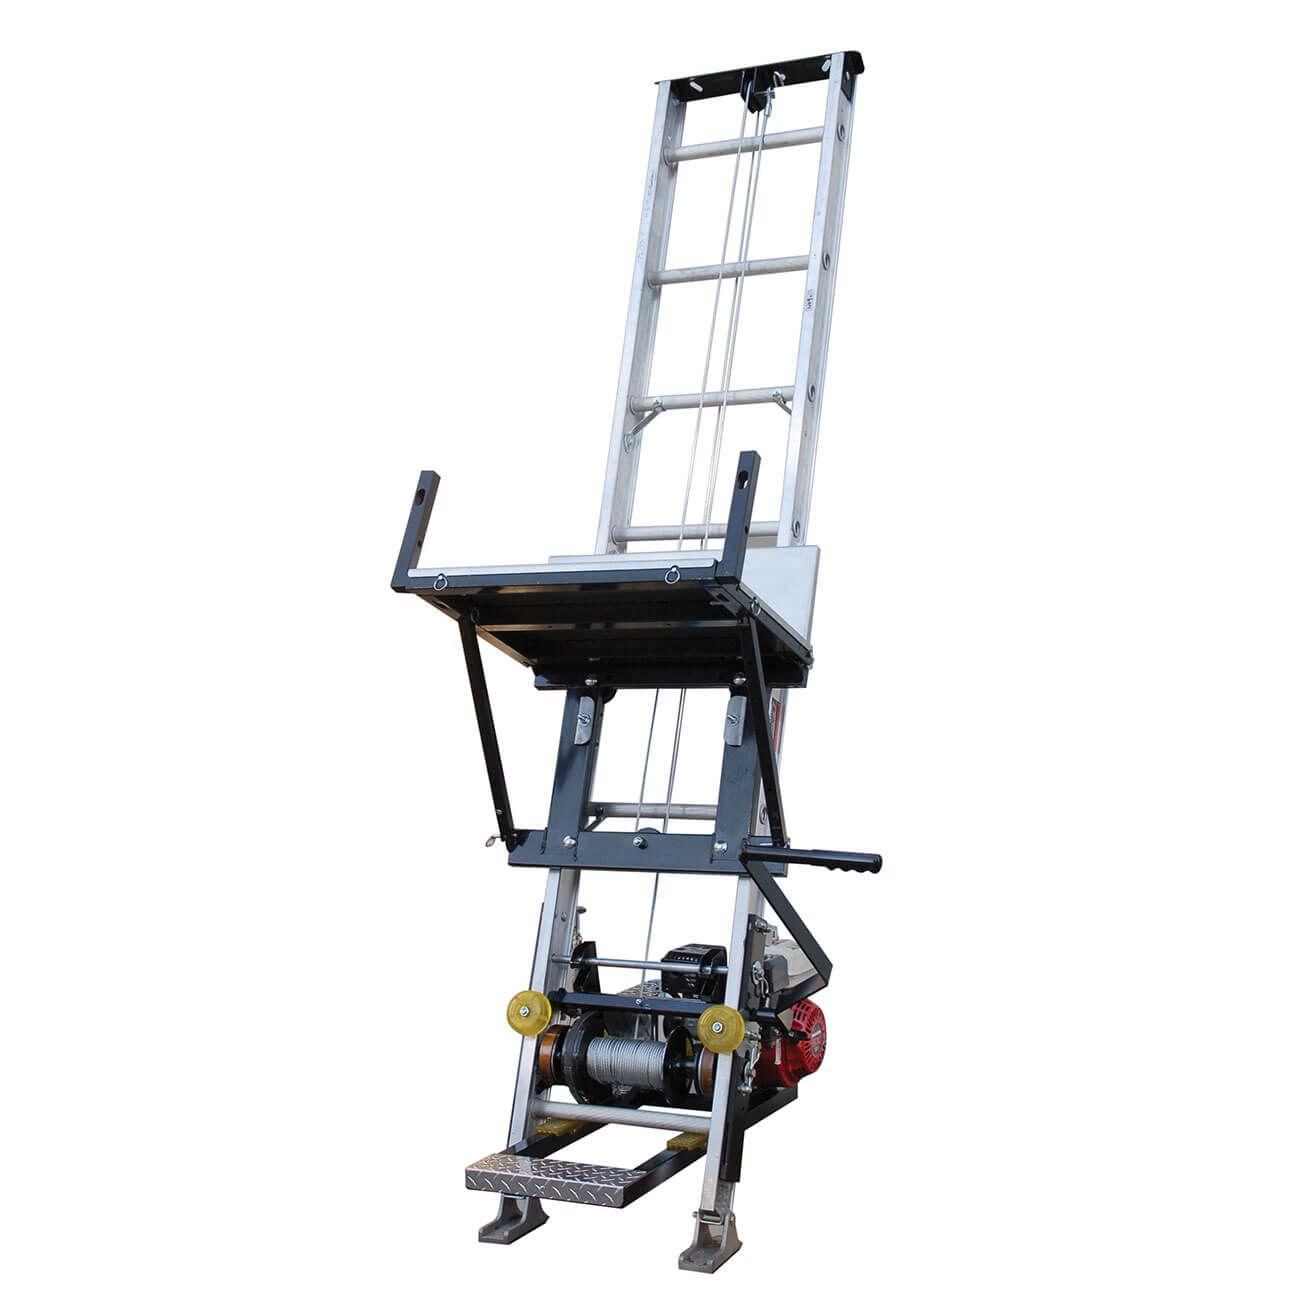 Tranzsporter Tp400 400lb 28ft Ladder Hoist Lifan Motor Aluminum Decking Hoist Ladder